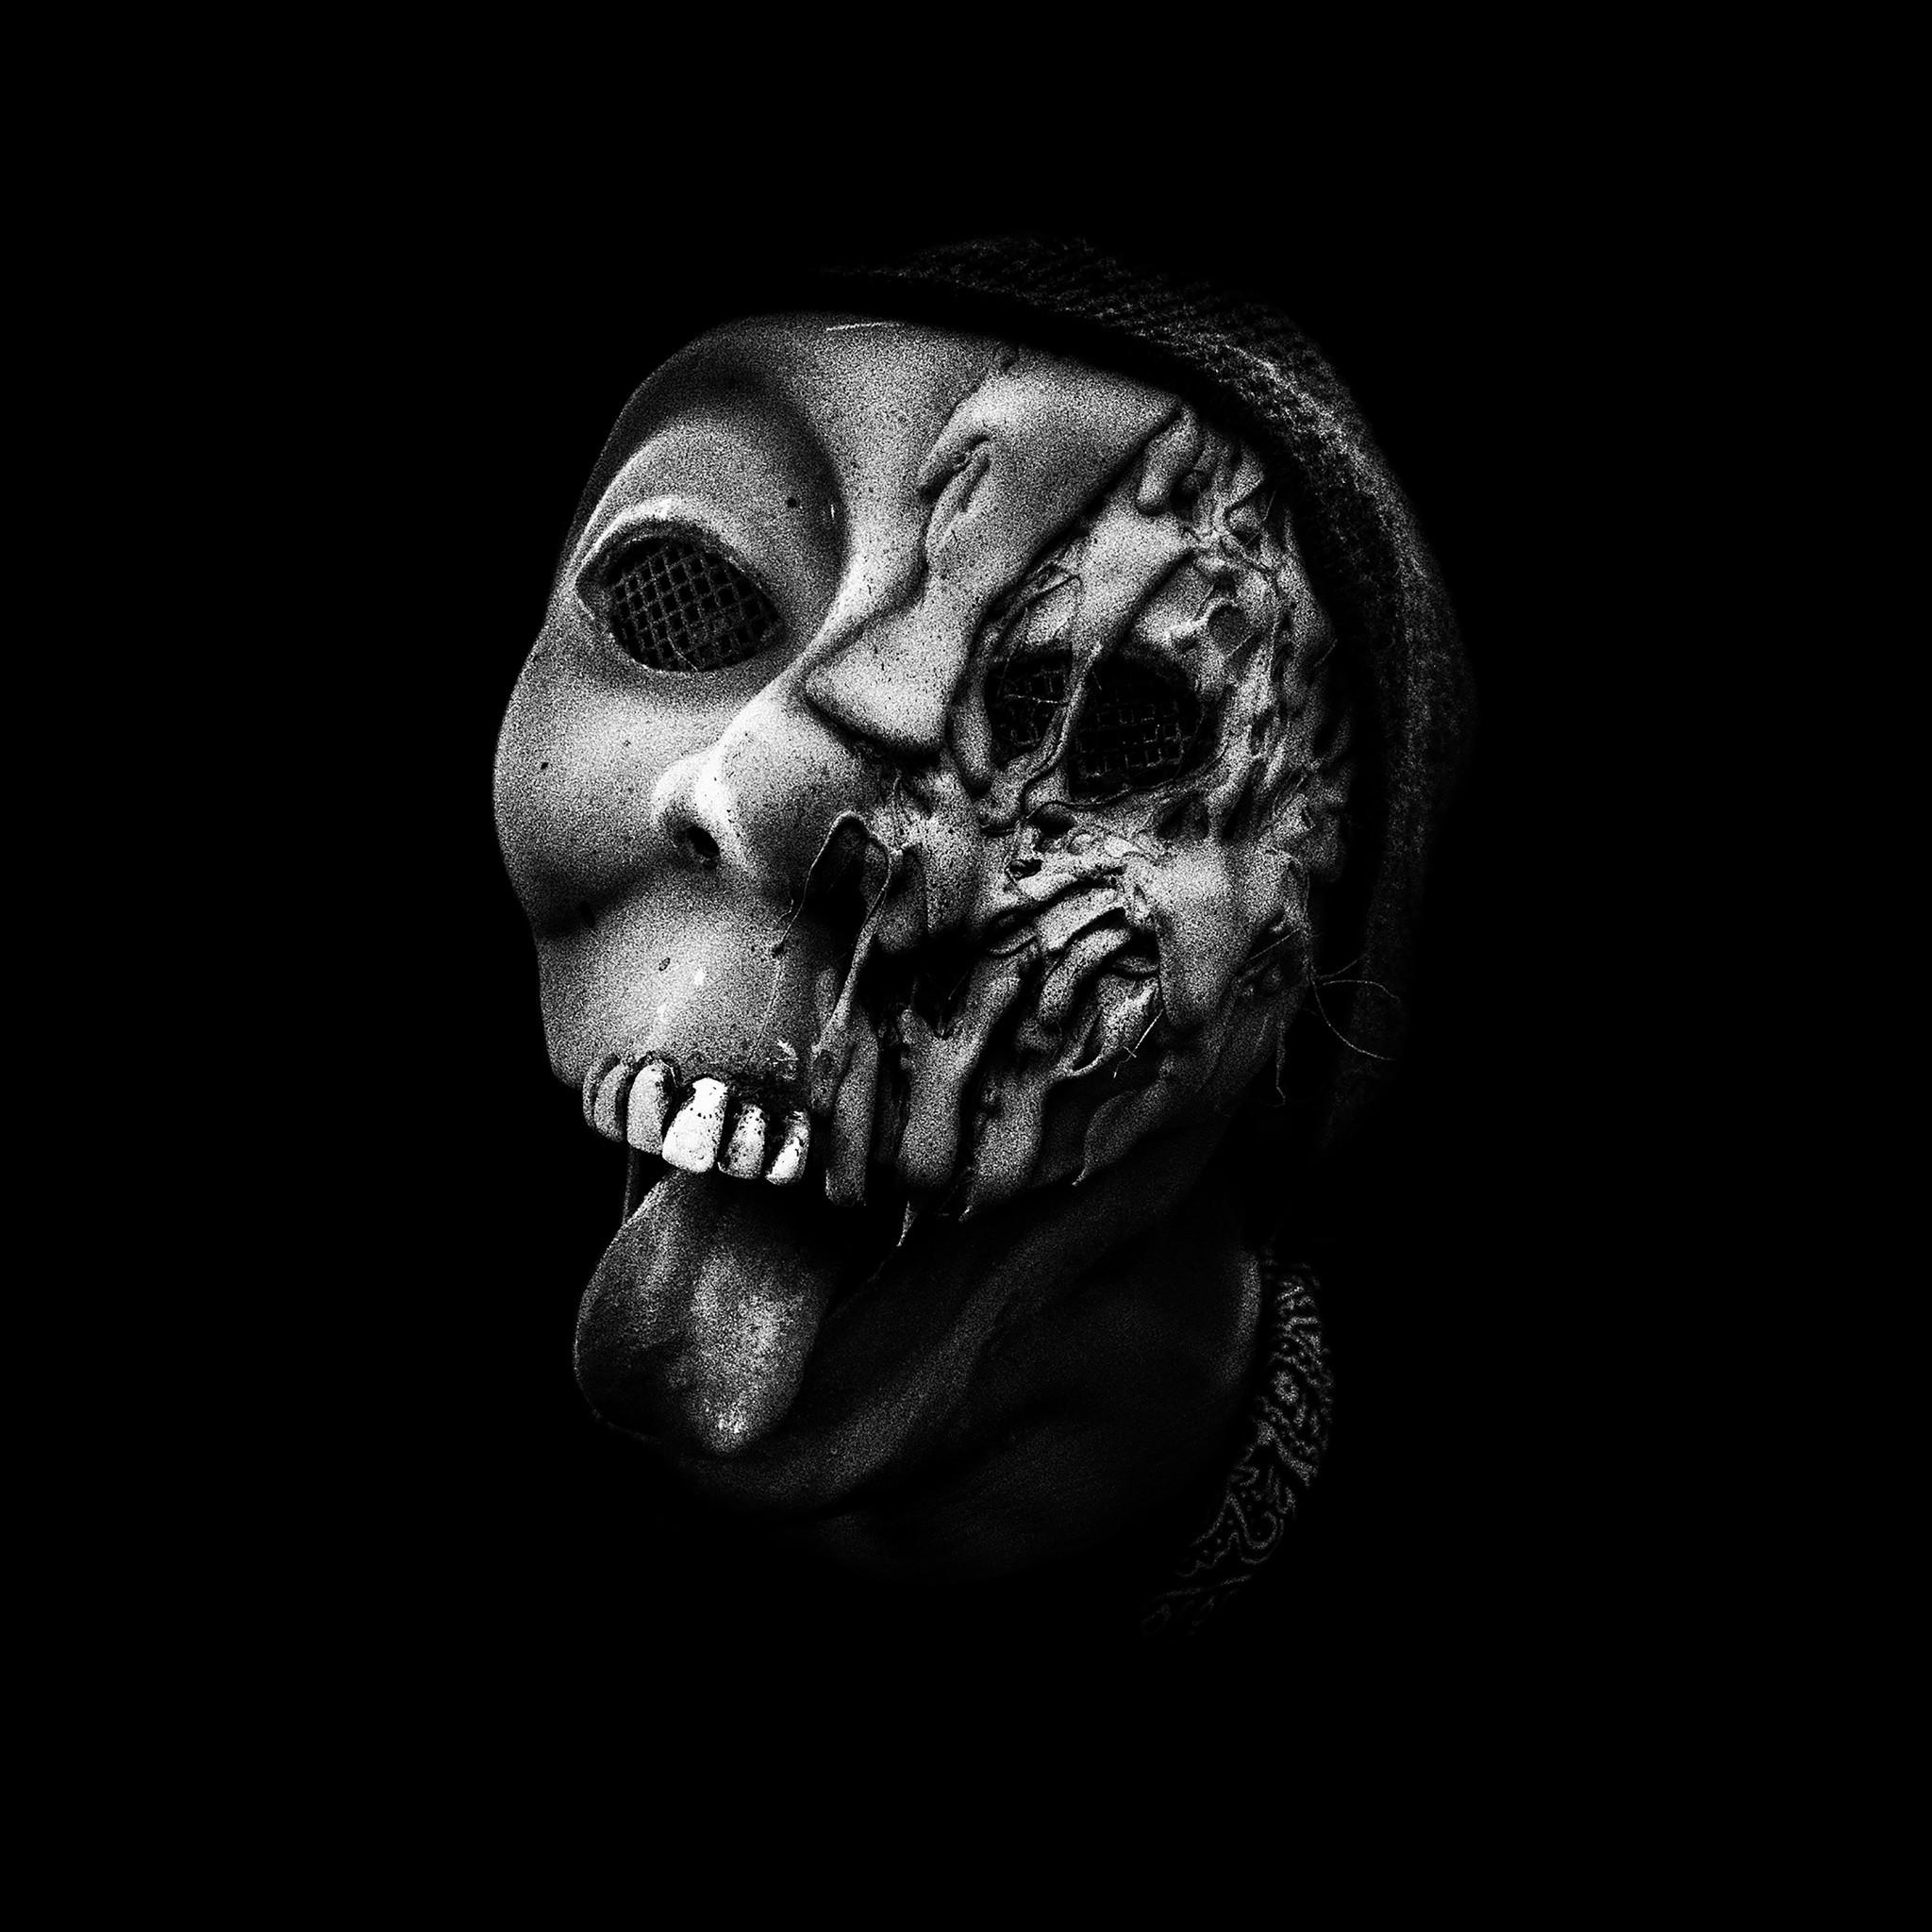 Halloween Horror HD Wallpapers